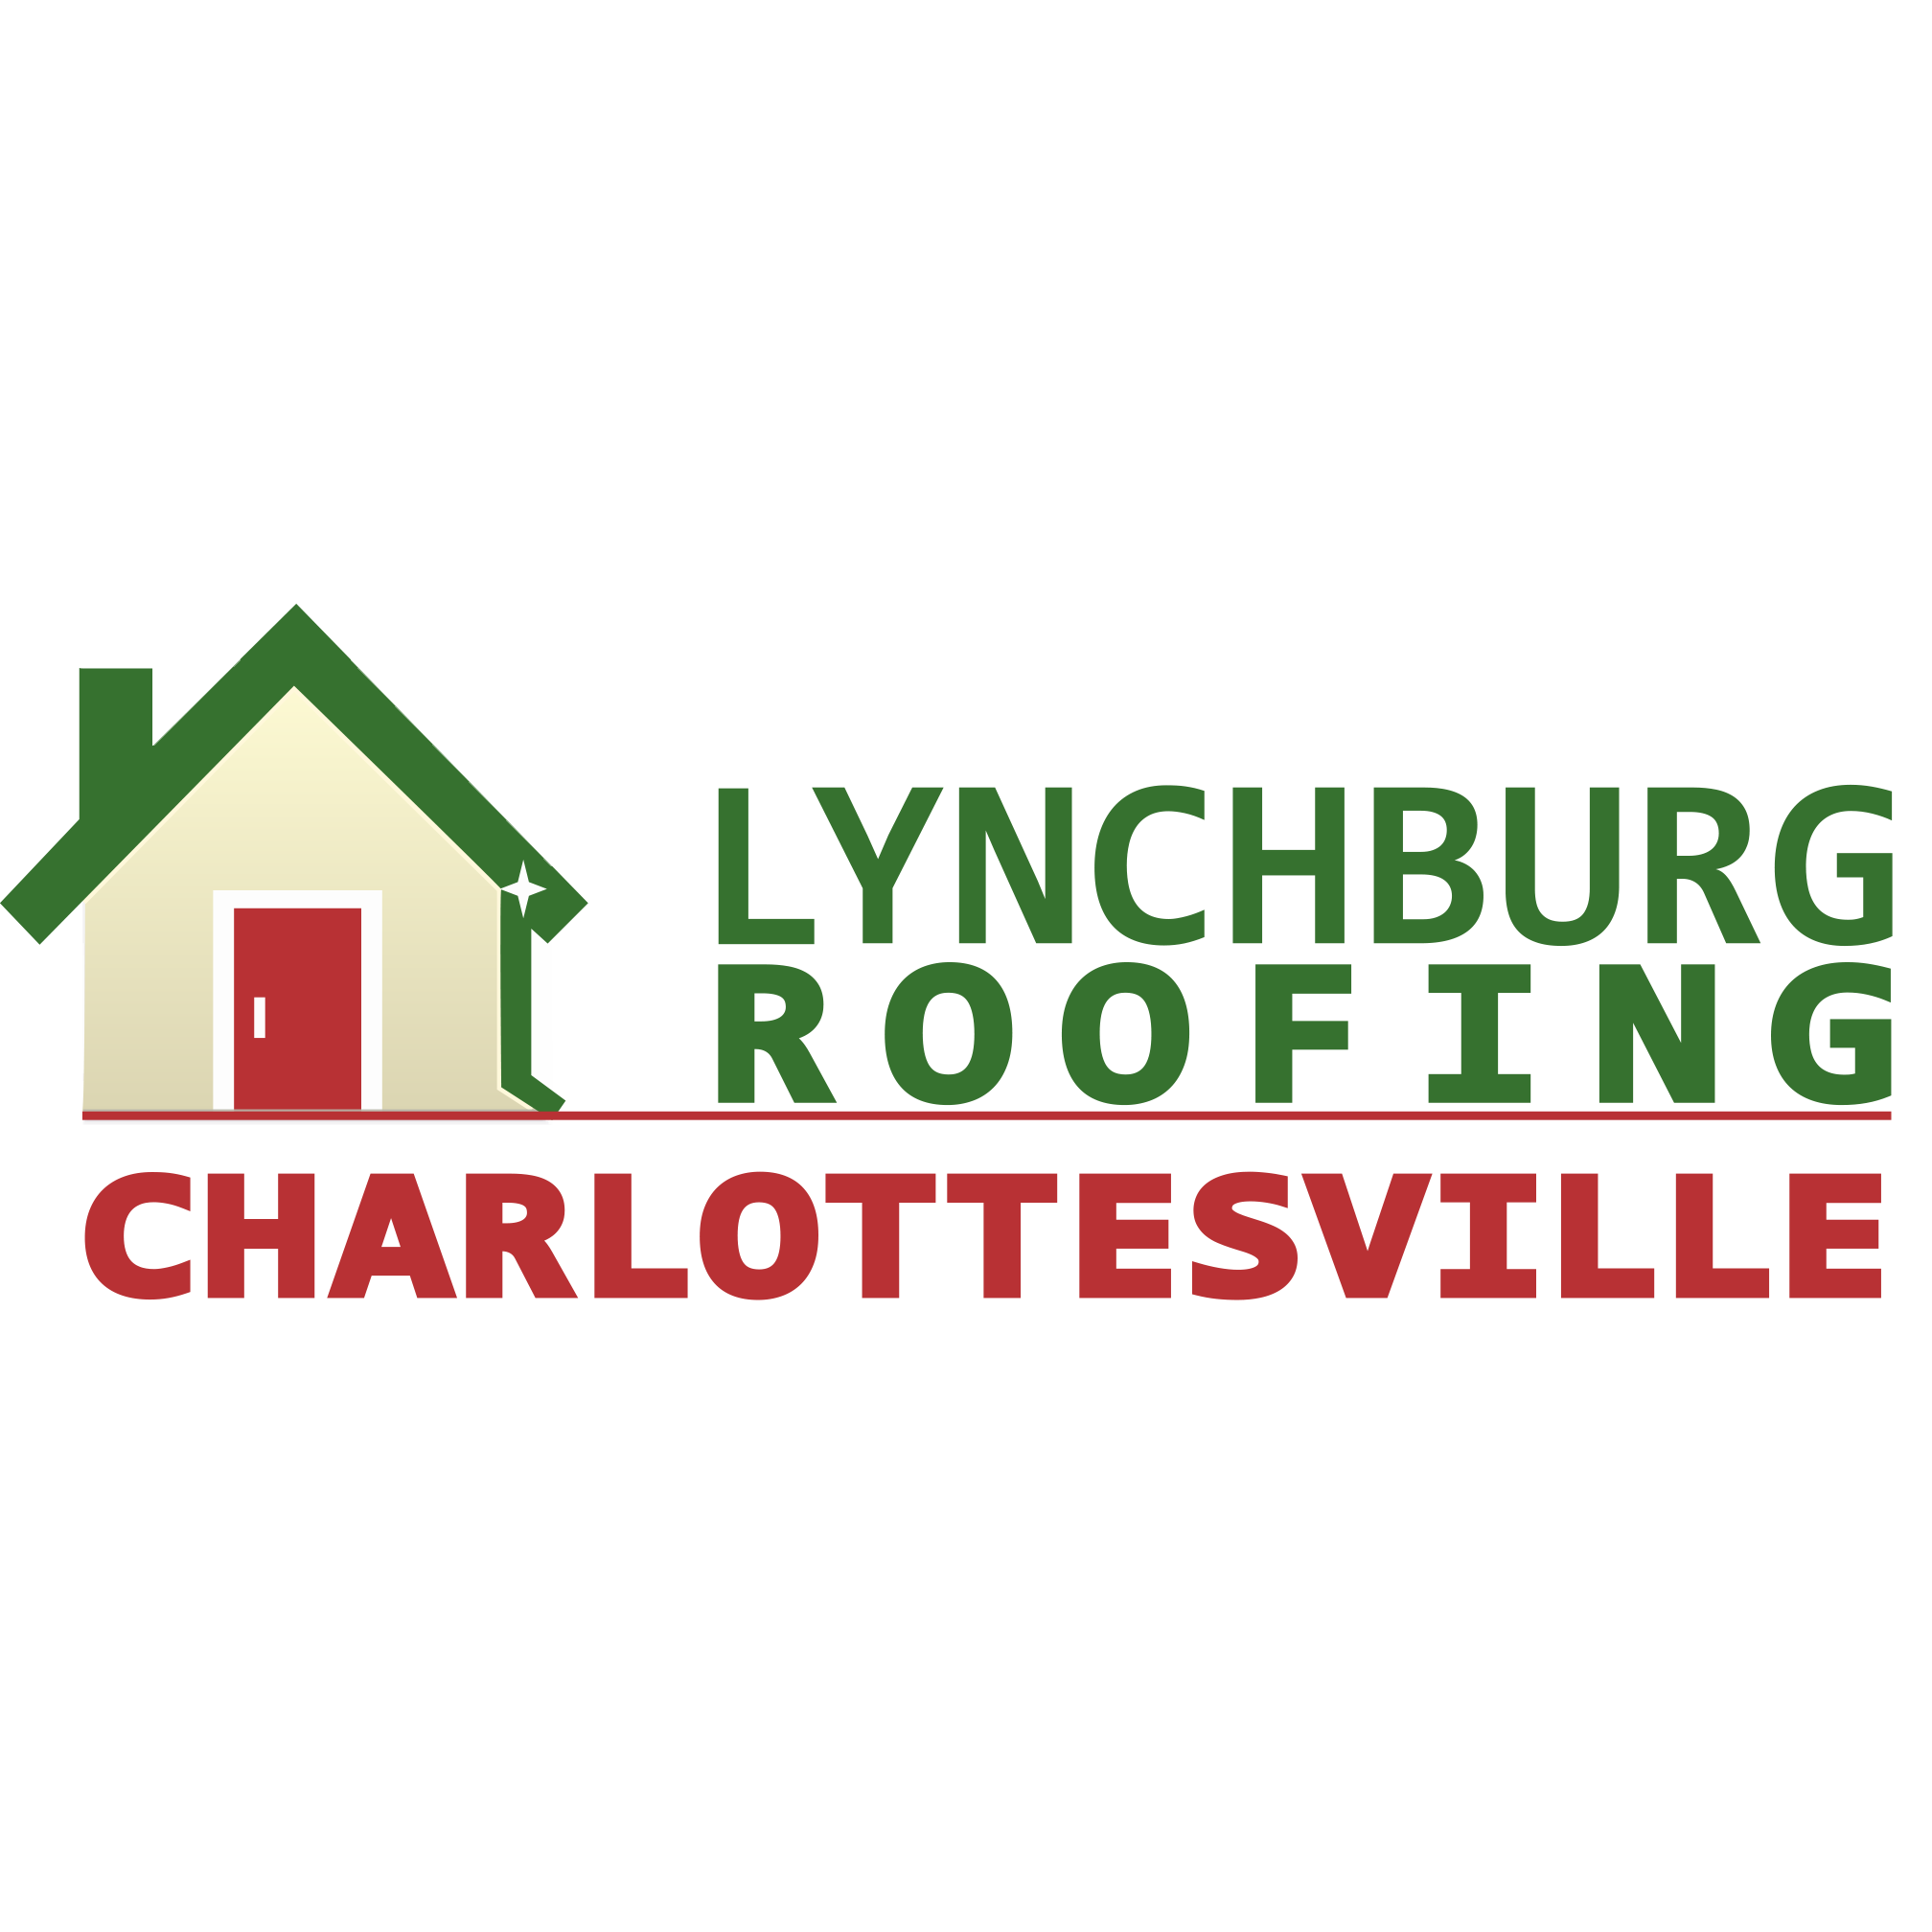 Lynchburg Roofing, Charlottesville